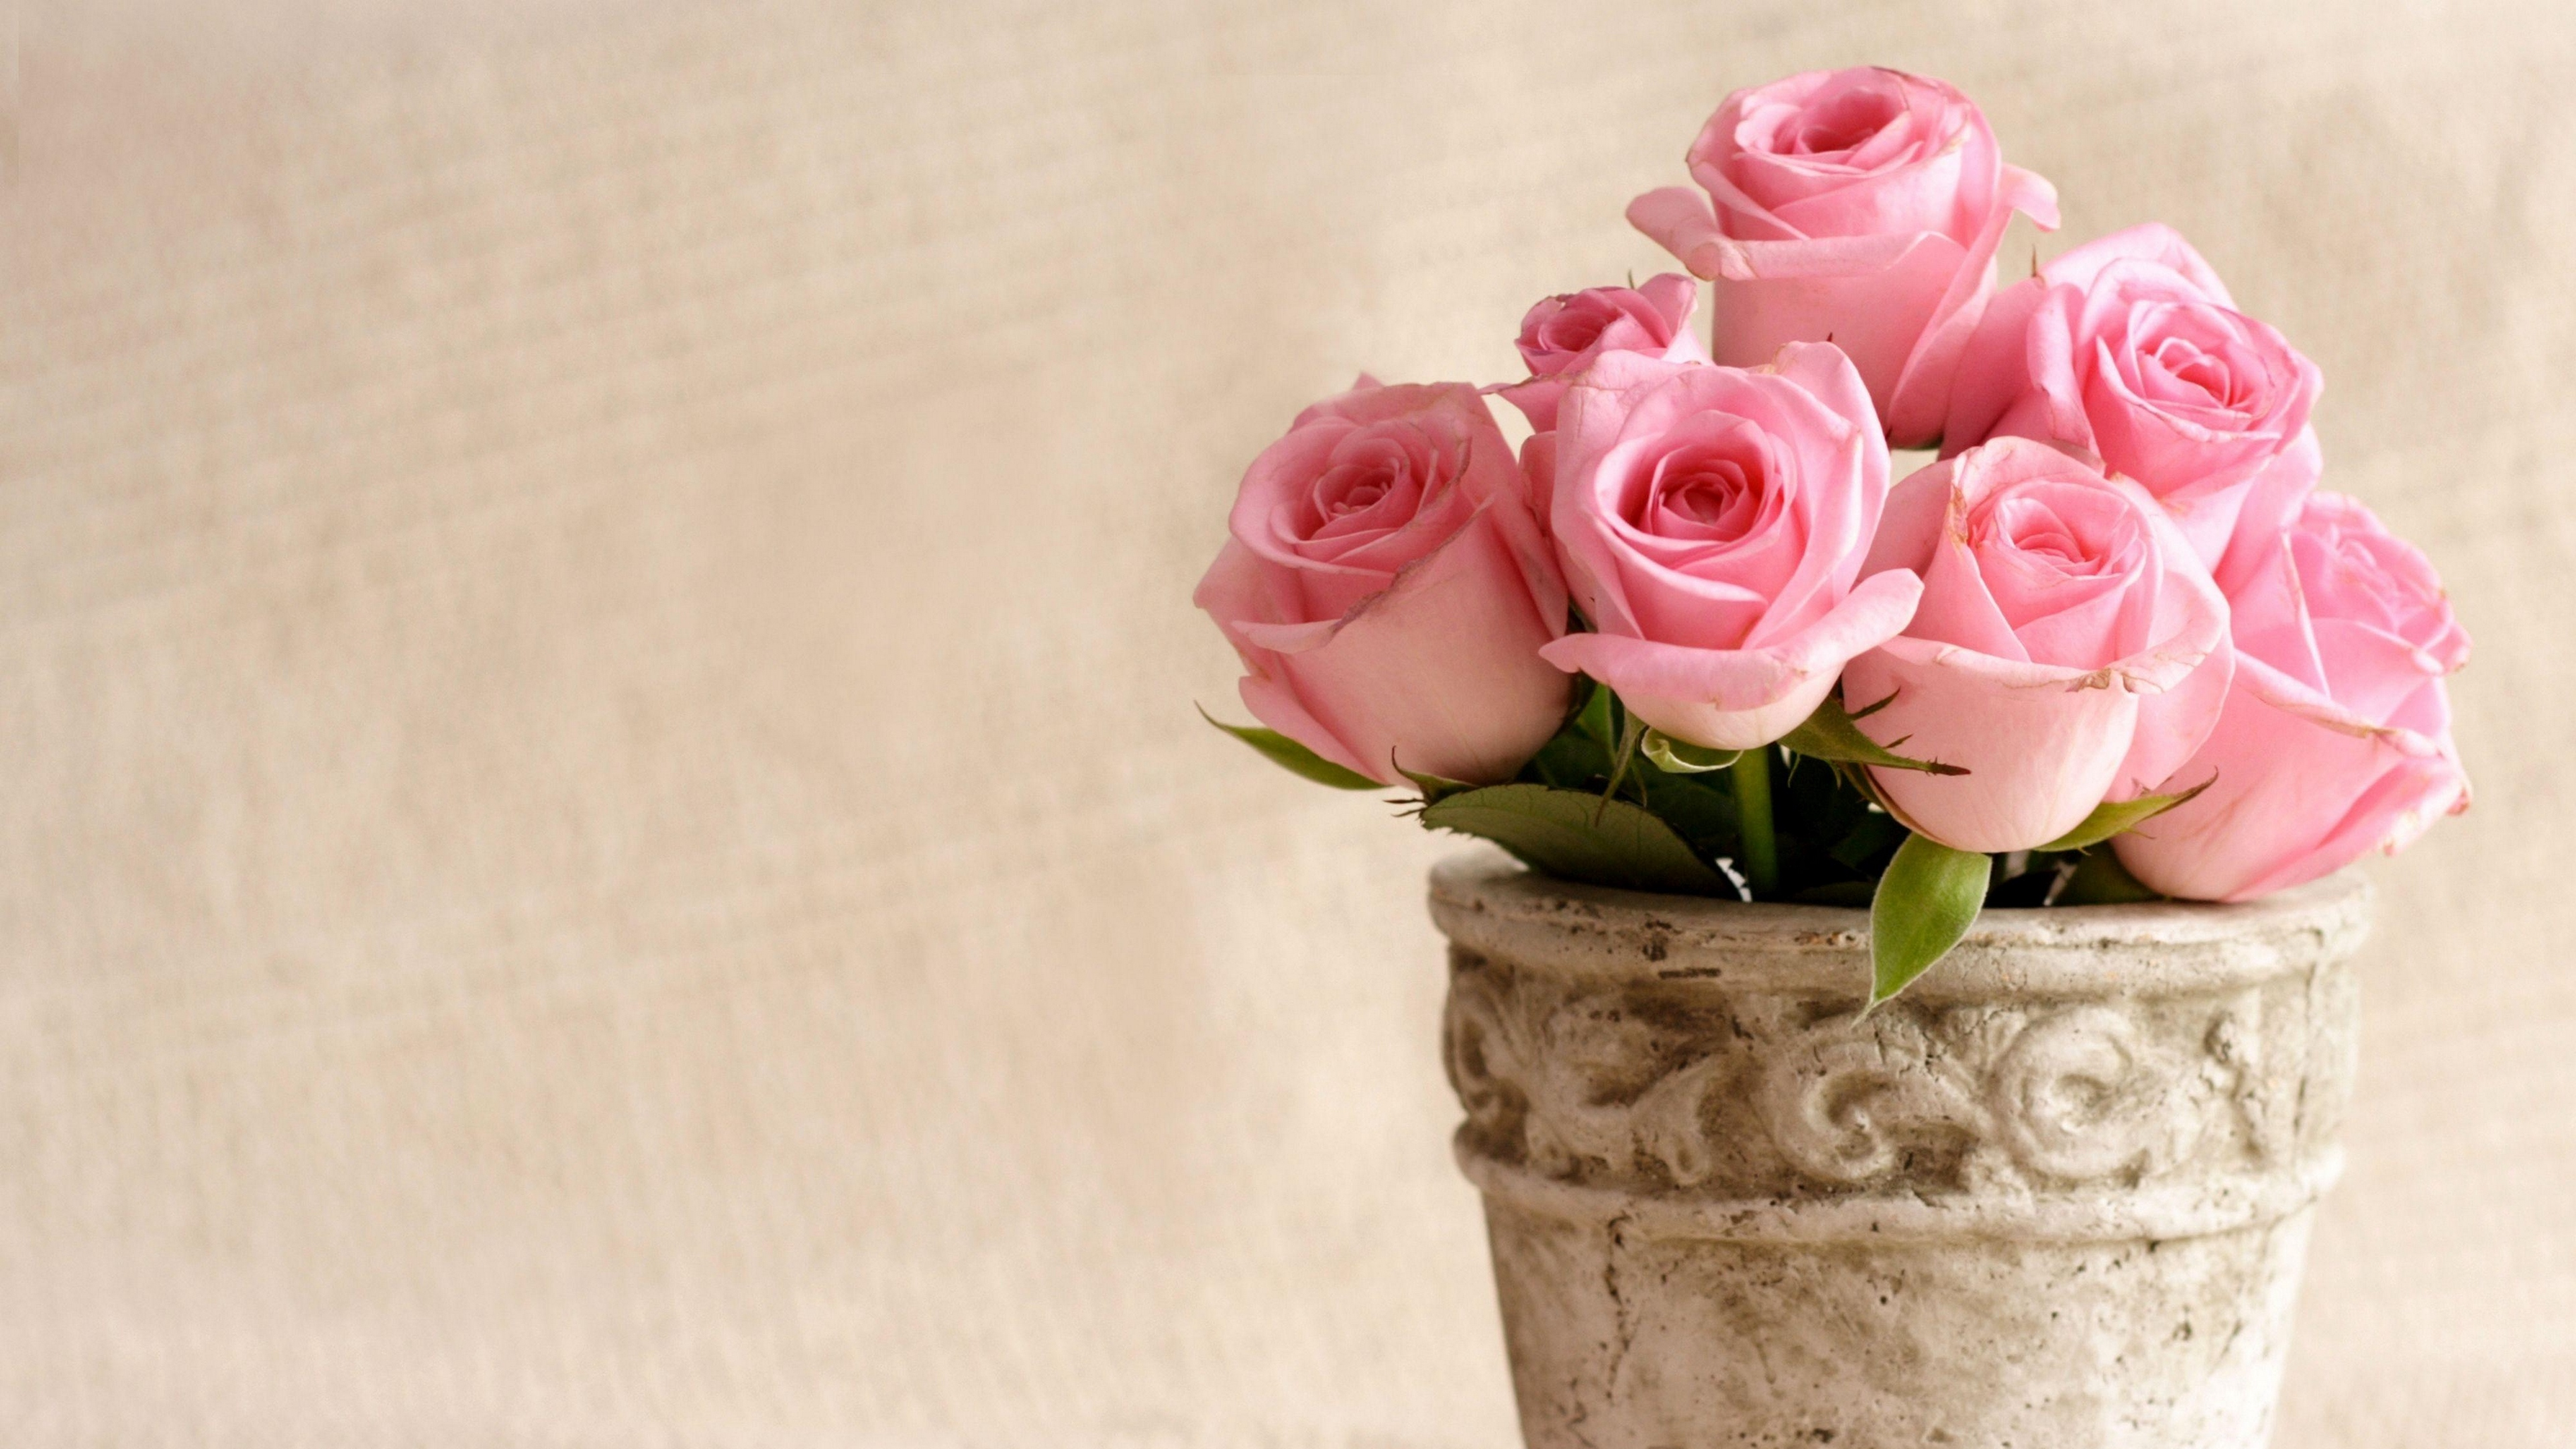 roses flowers pot petals 4k 1540065263 - roses, flowers, pot, petals 4k - Roses, pot, Flowers